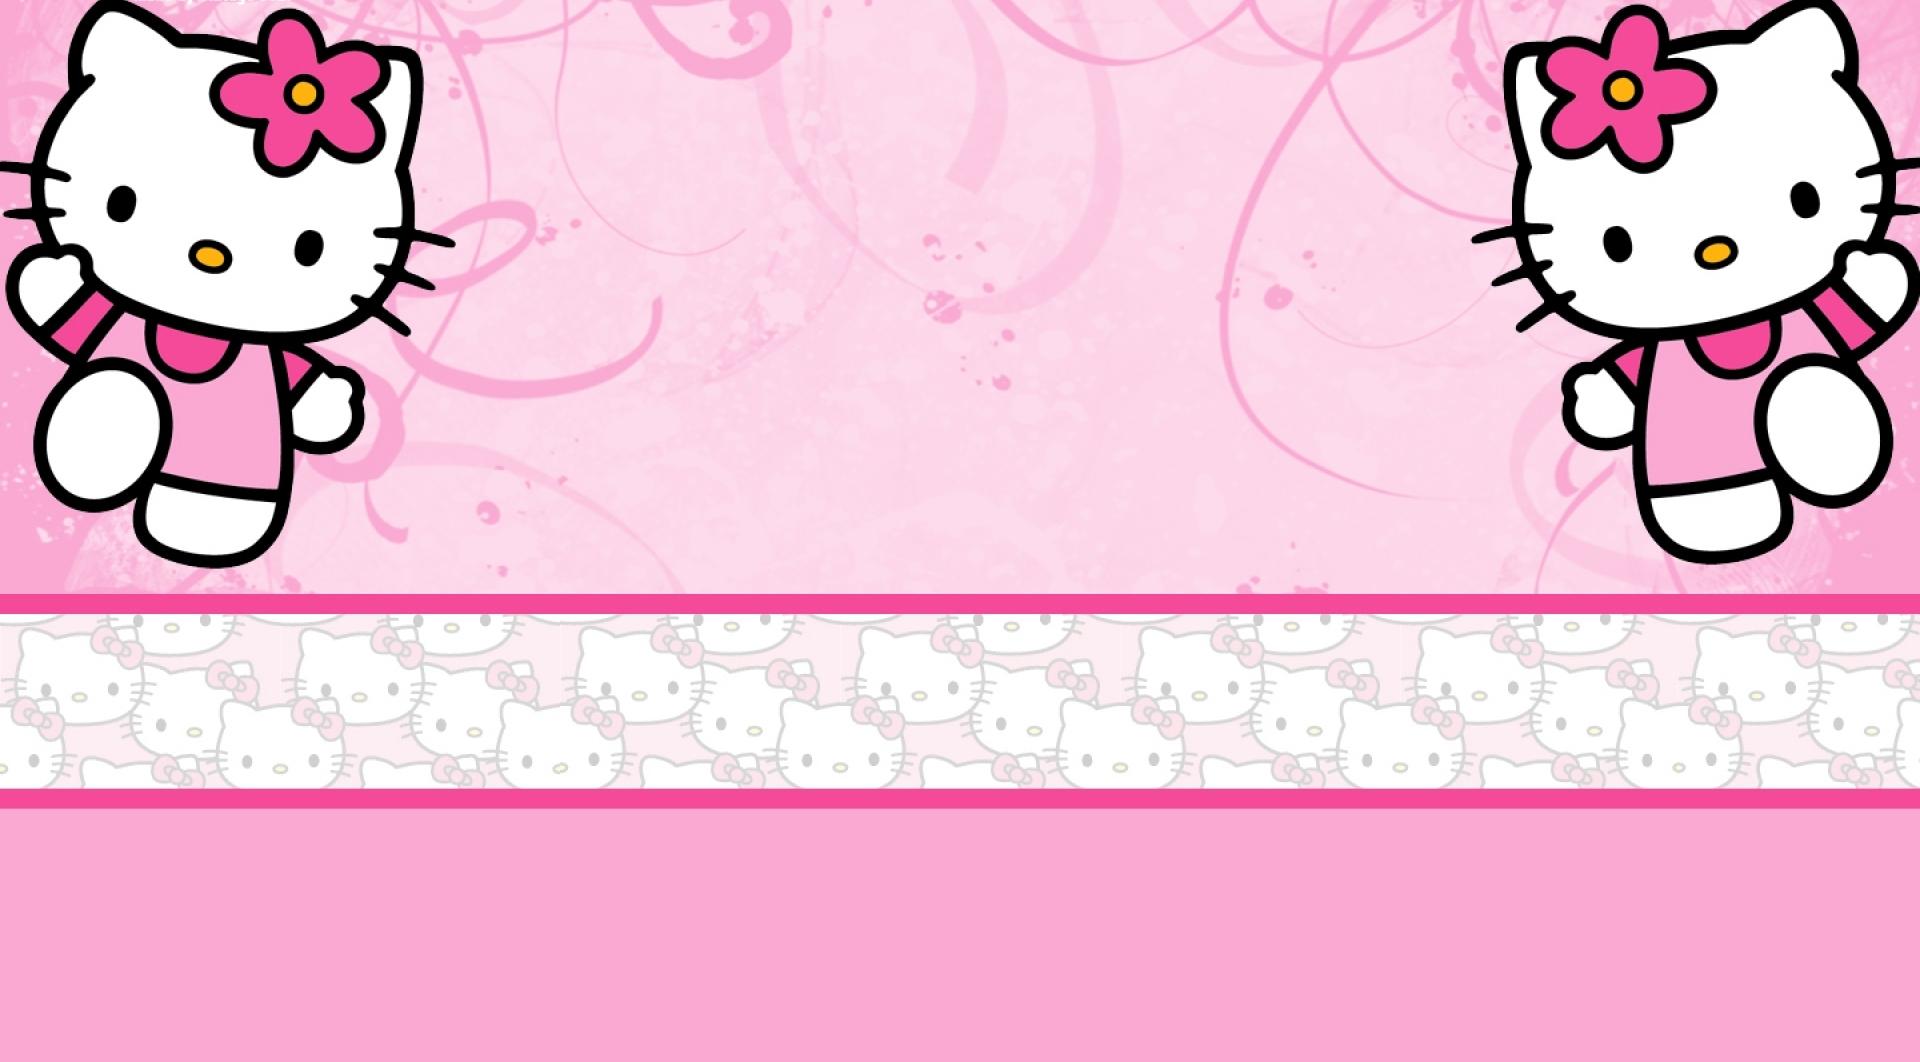 hello kitty wallpapers download. - media file | pixelstalk